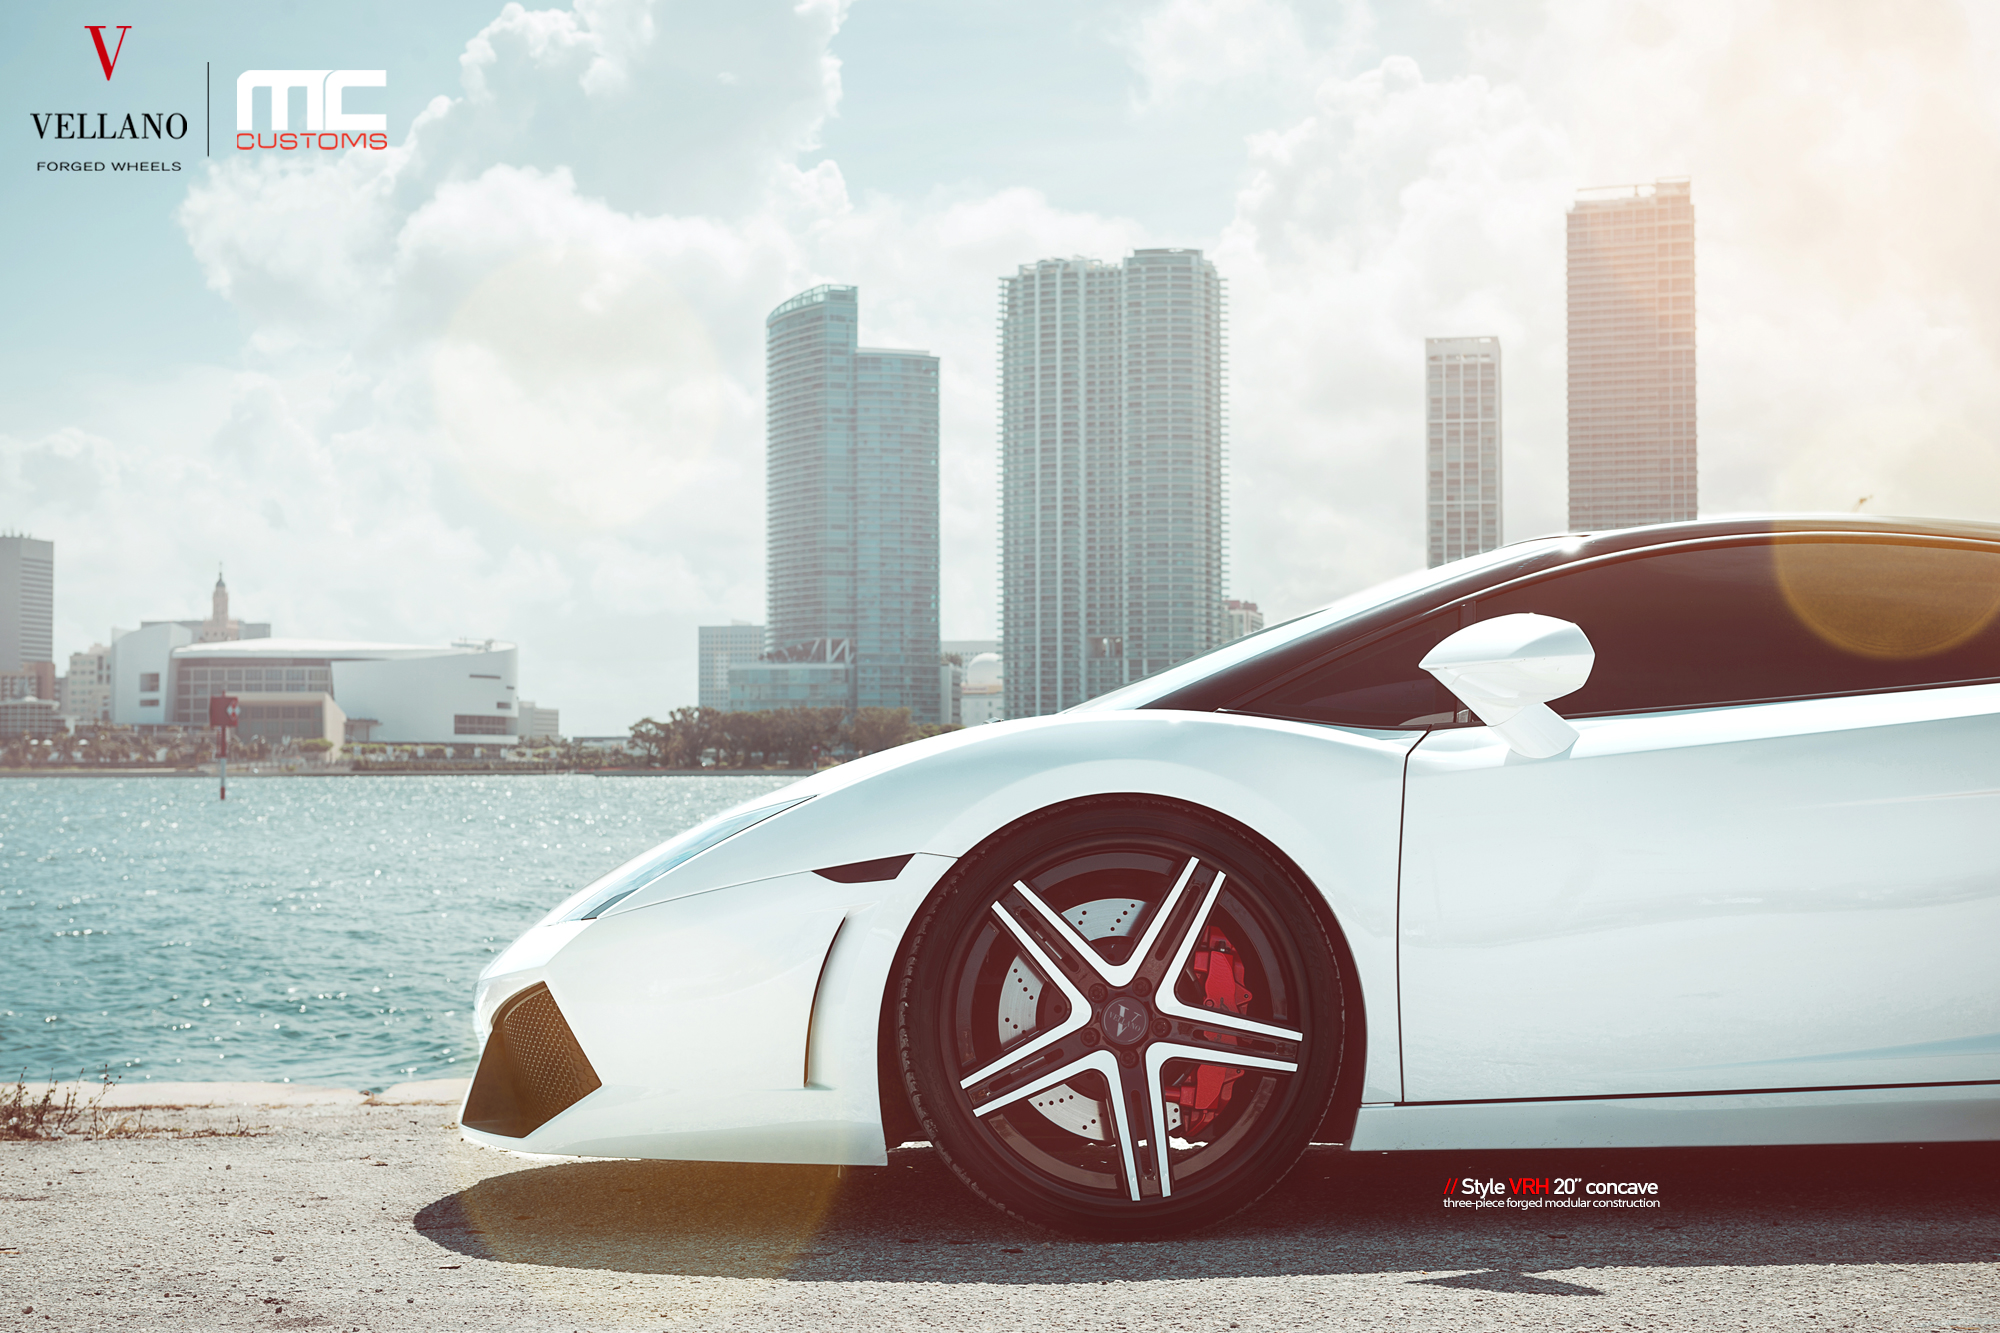 lp560 Lamborghini Gallardo vellano wheels vrh concave